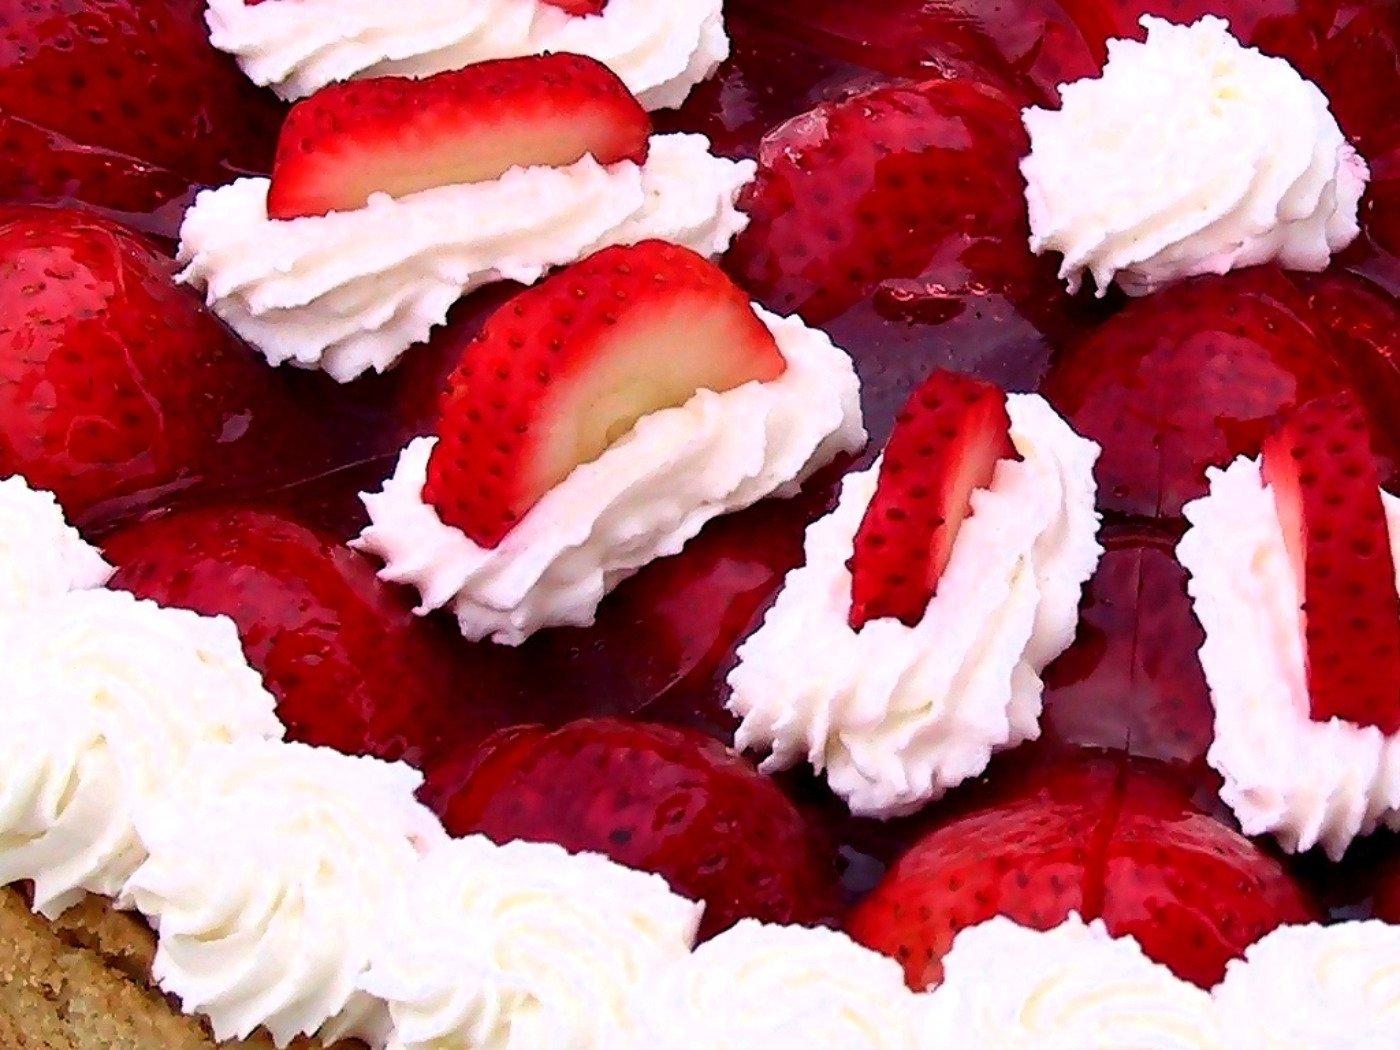 Alimento - Strawberry  Sfondo